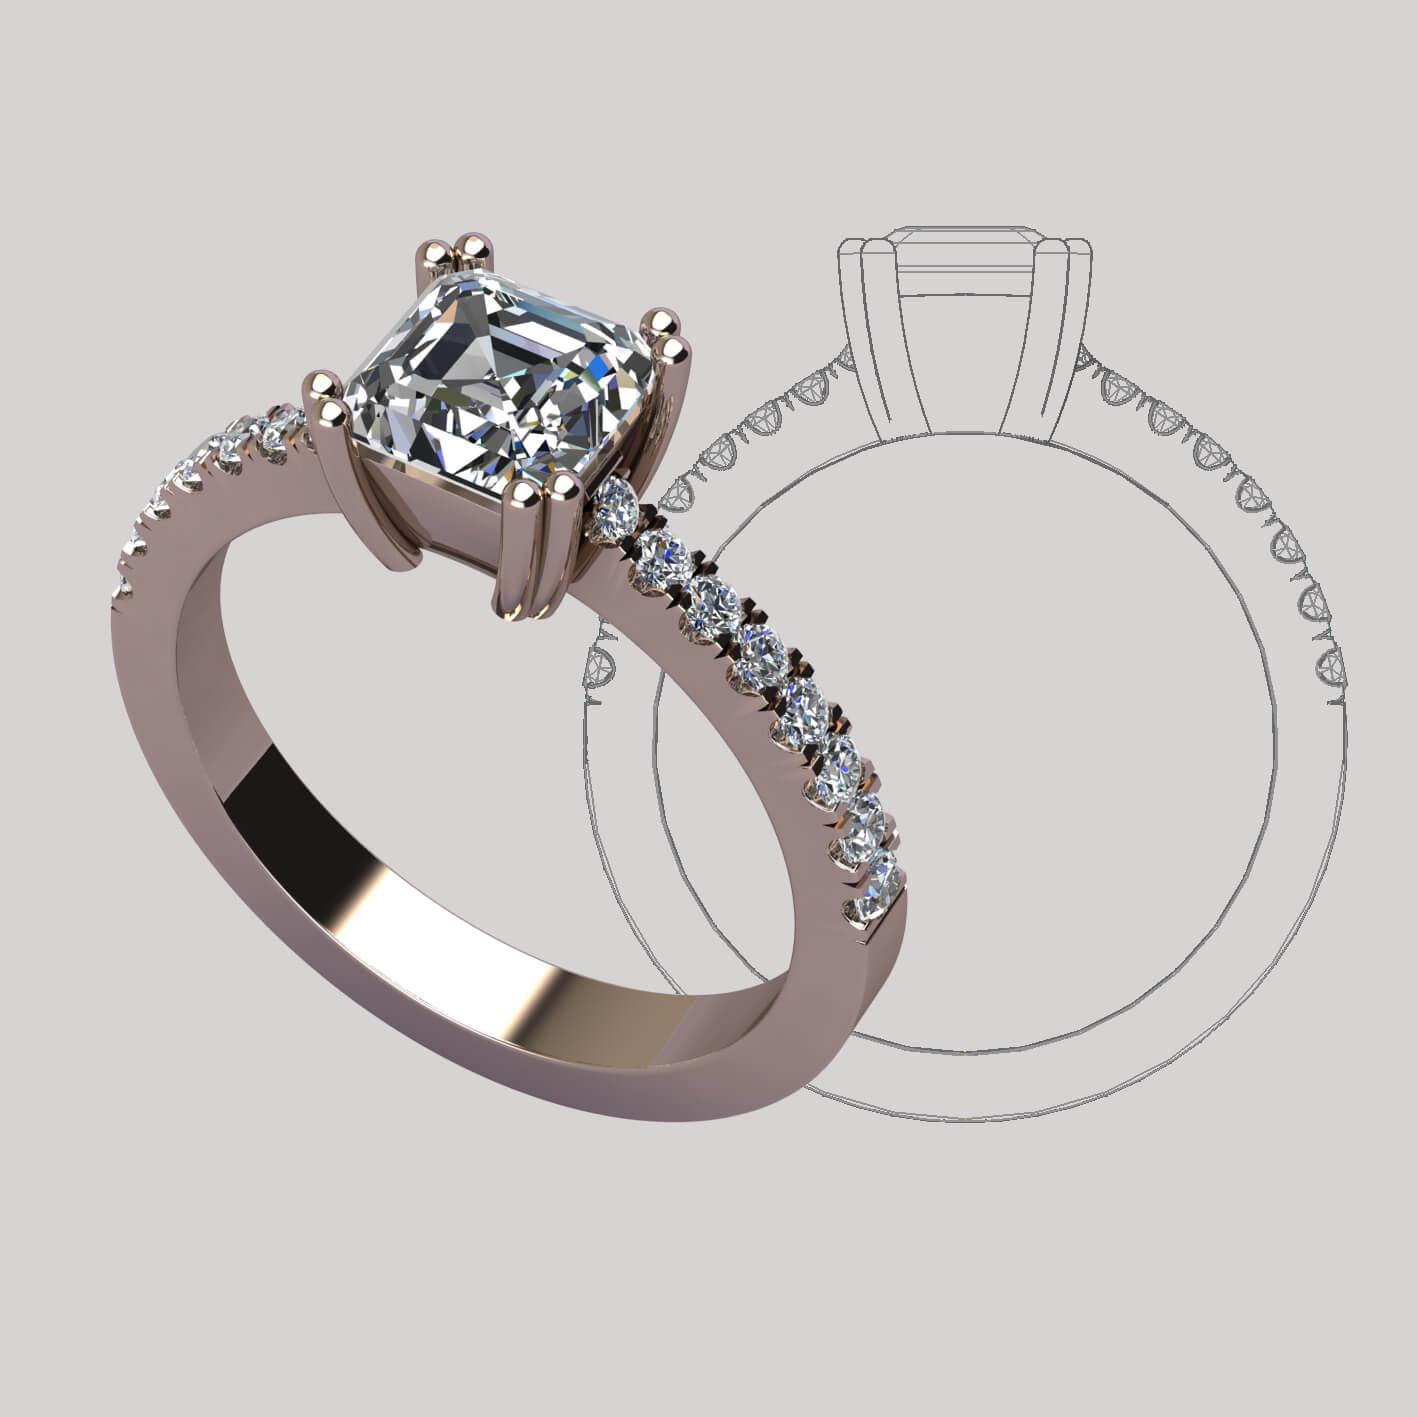 Designa egen ring